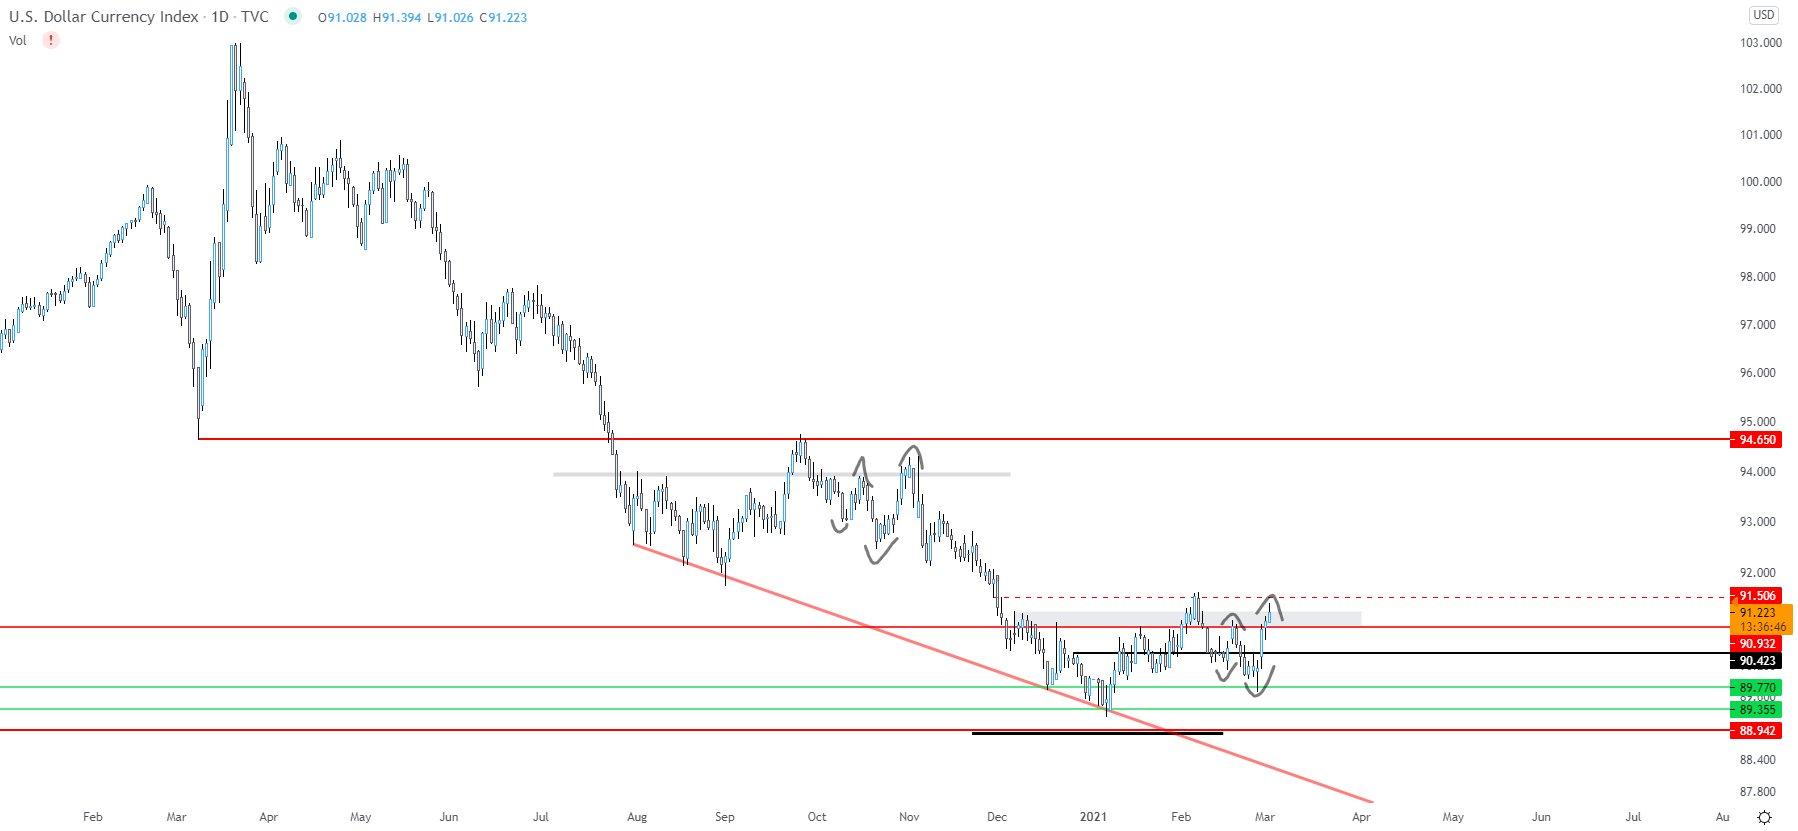 The U.S. dollar index. Source: Tradingview.com, Bitcoin Jack